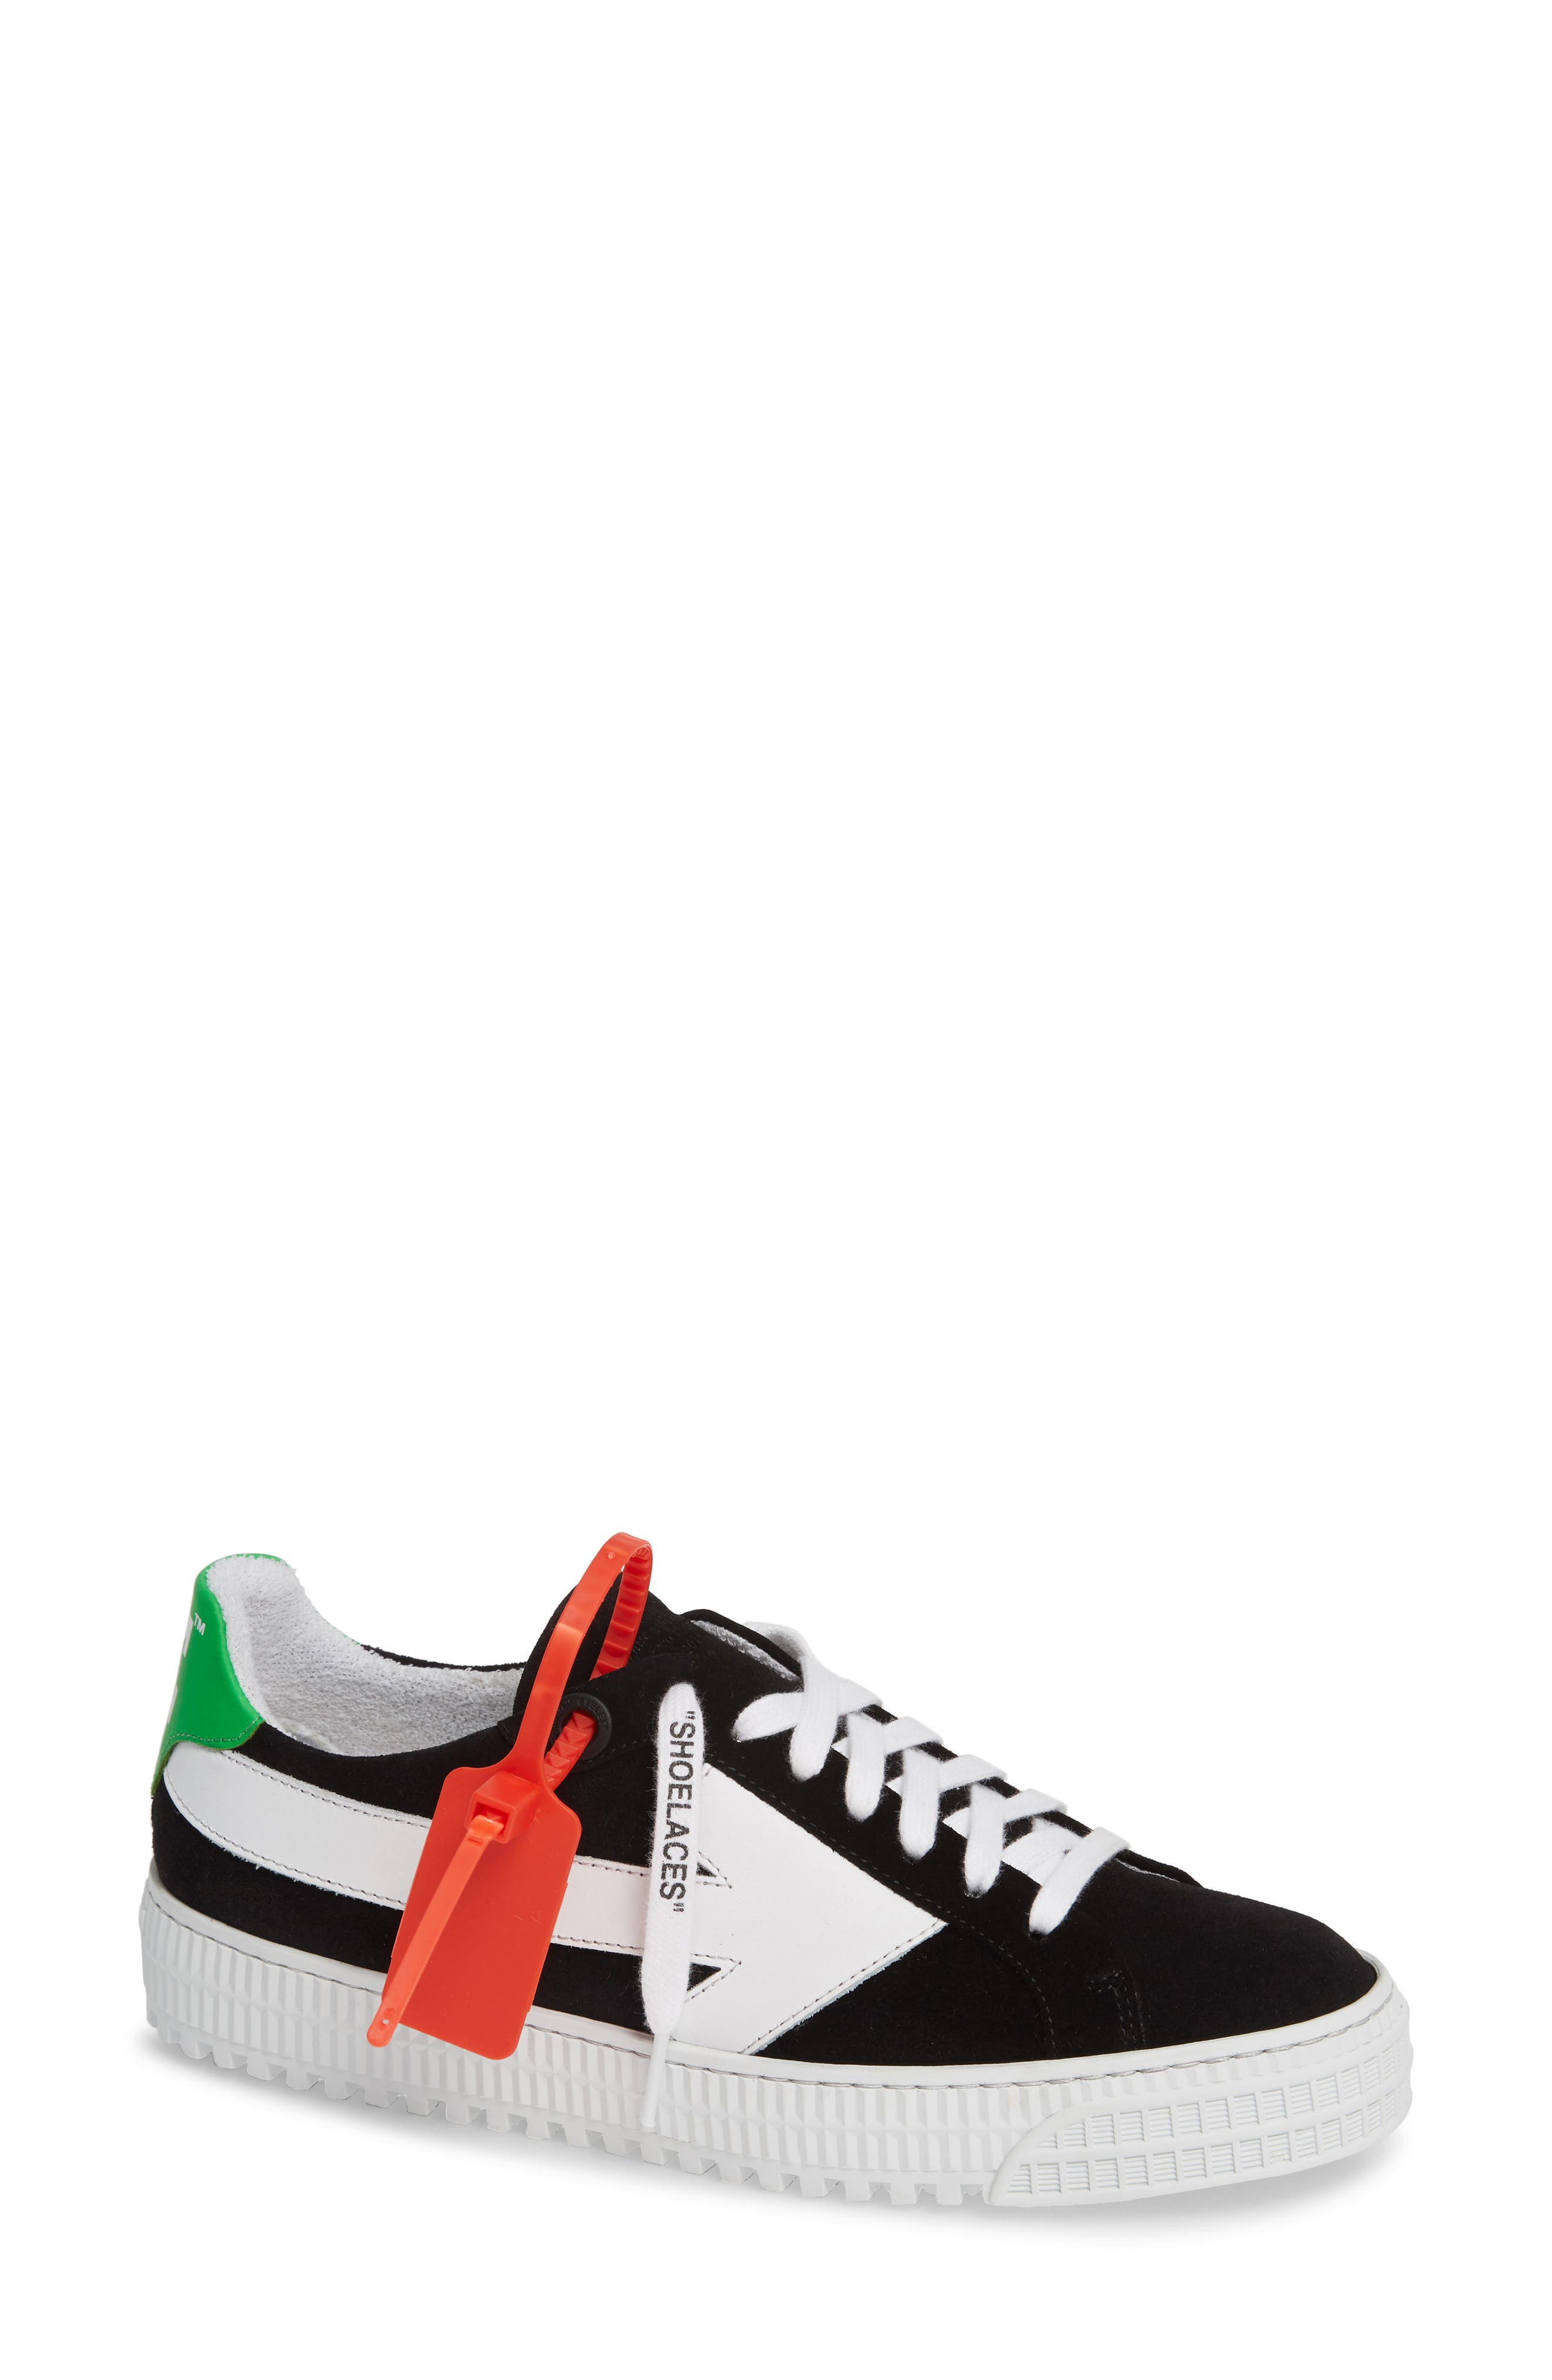 OFF-WHITE Arrow Sneaker, Main, color, BLACK WHITE